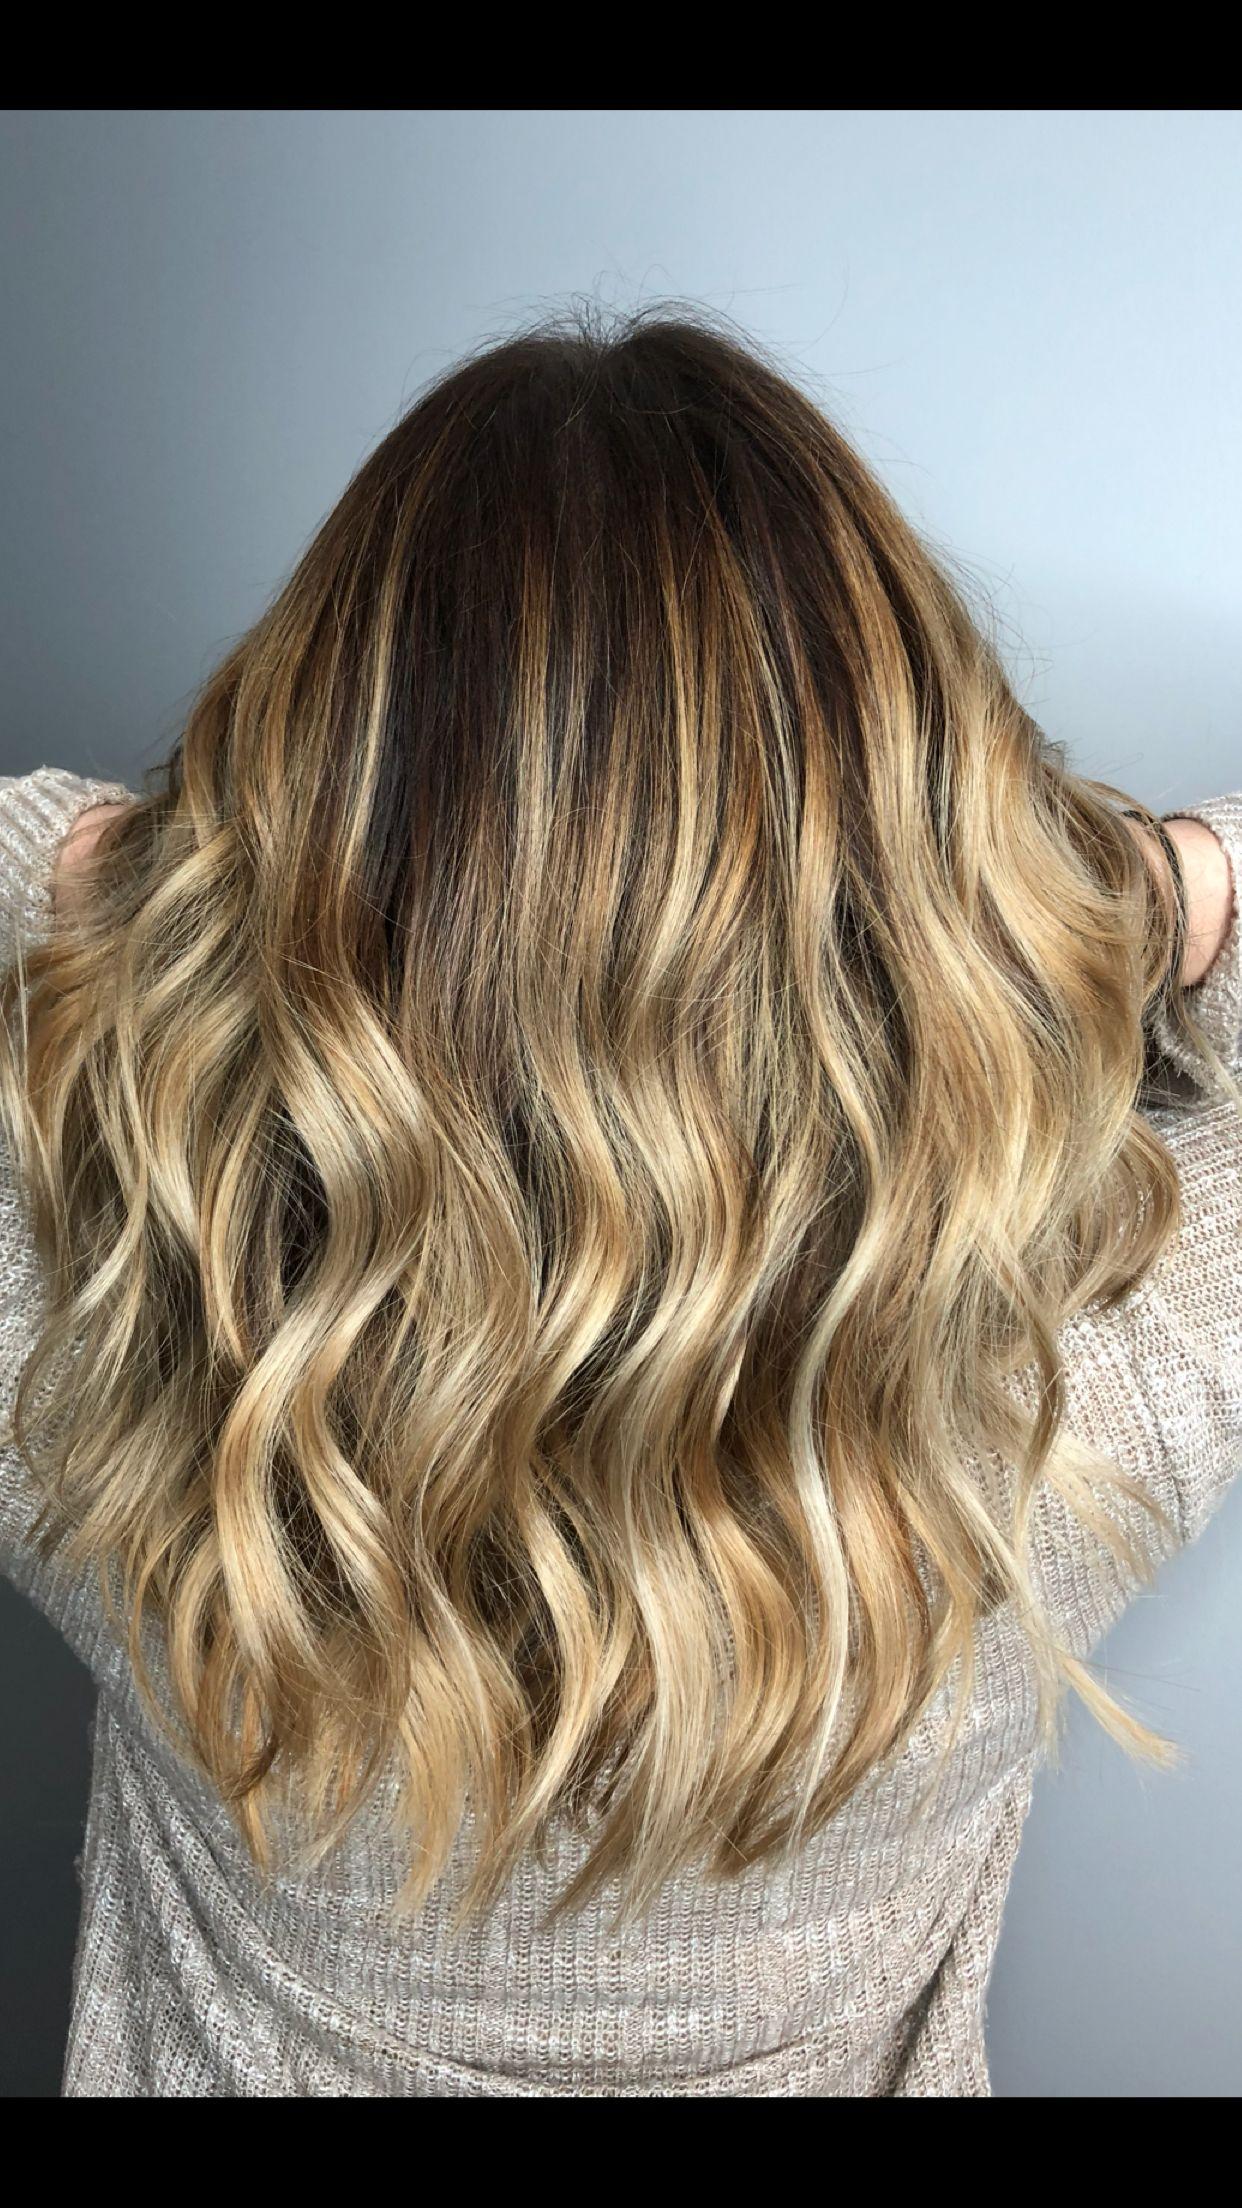 Hair Blonde Caramel Highlight Long Hair Styles Hair Hair Styles